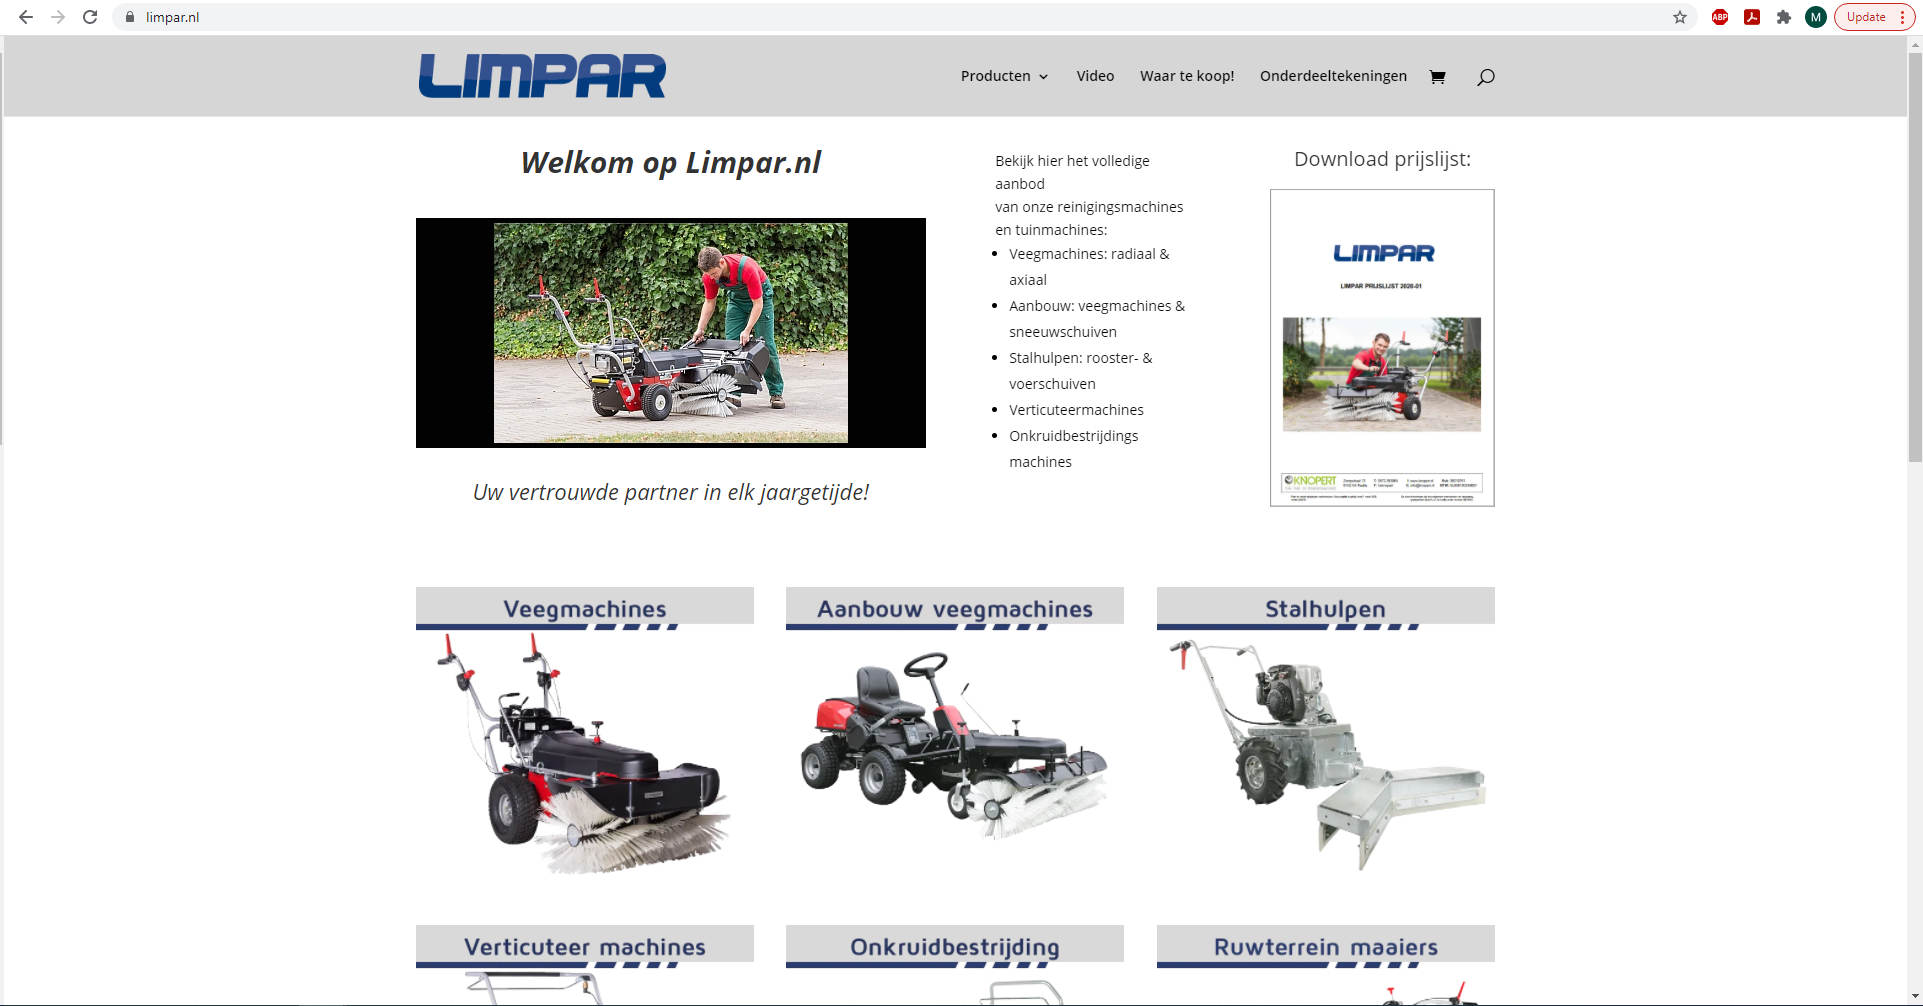 Limpar machines